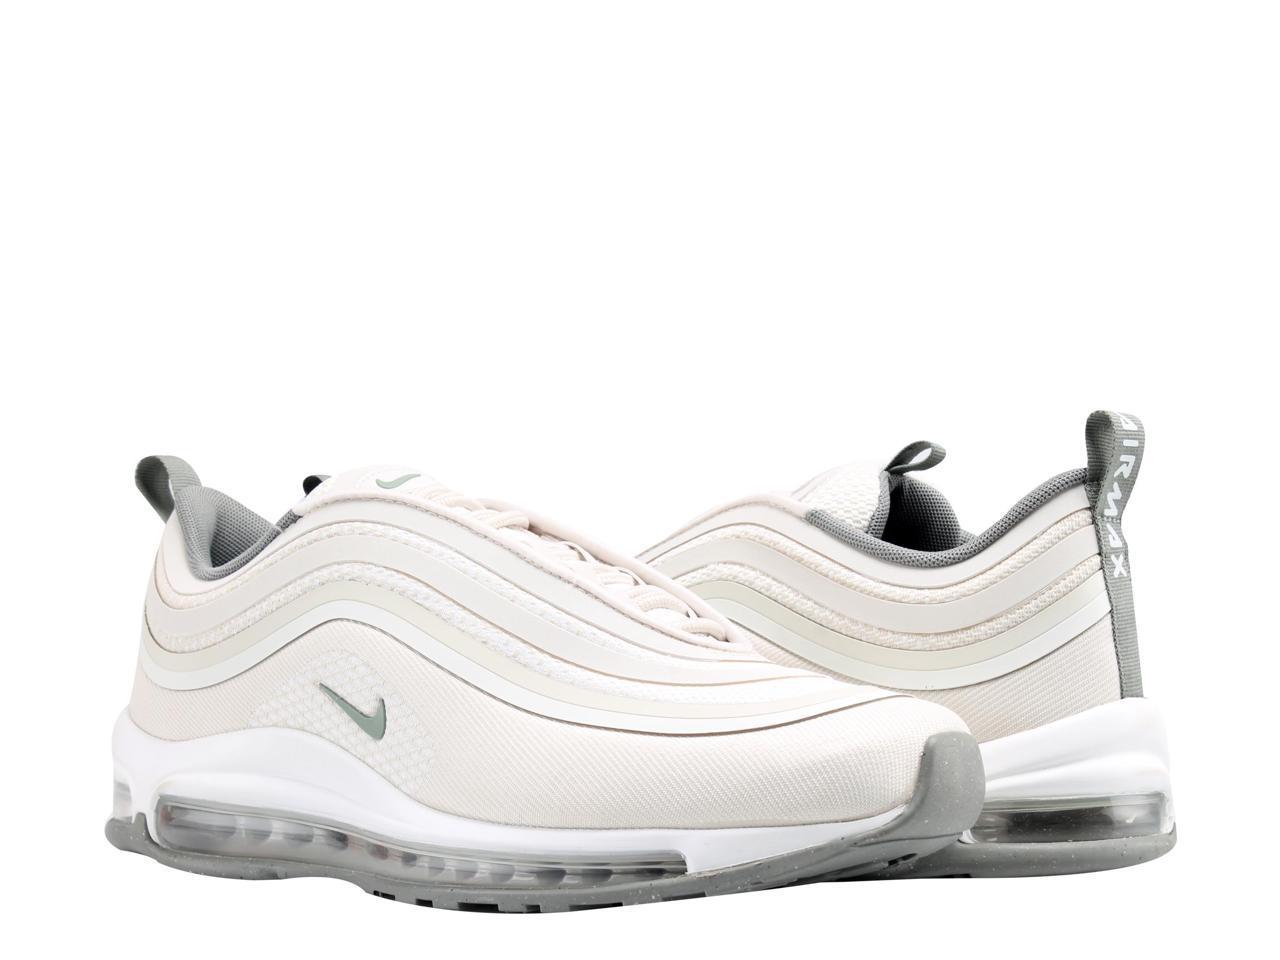 Nike Air Max 97 Shoes Ultra '17 LT.Orewood/D.Stucco Men's Shoes 97 918356-100 Size 12 27e1fe